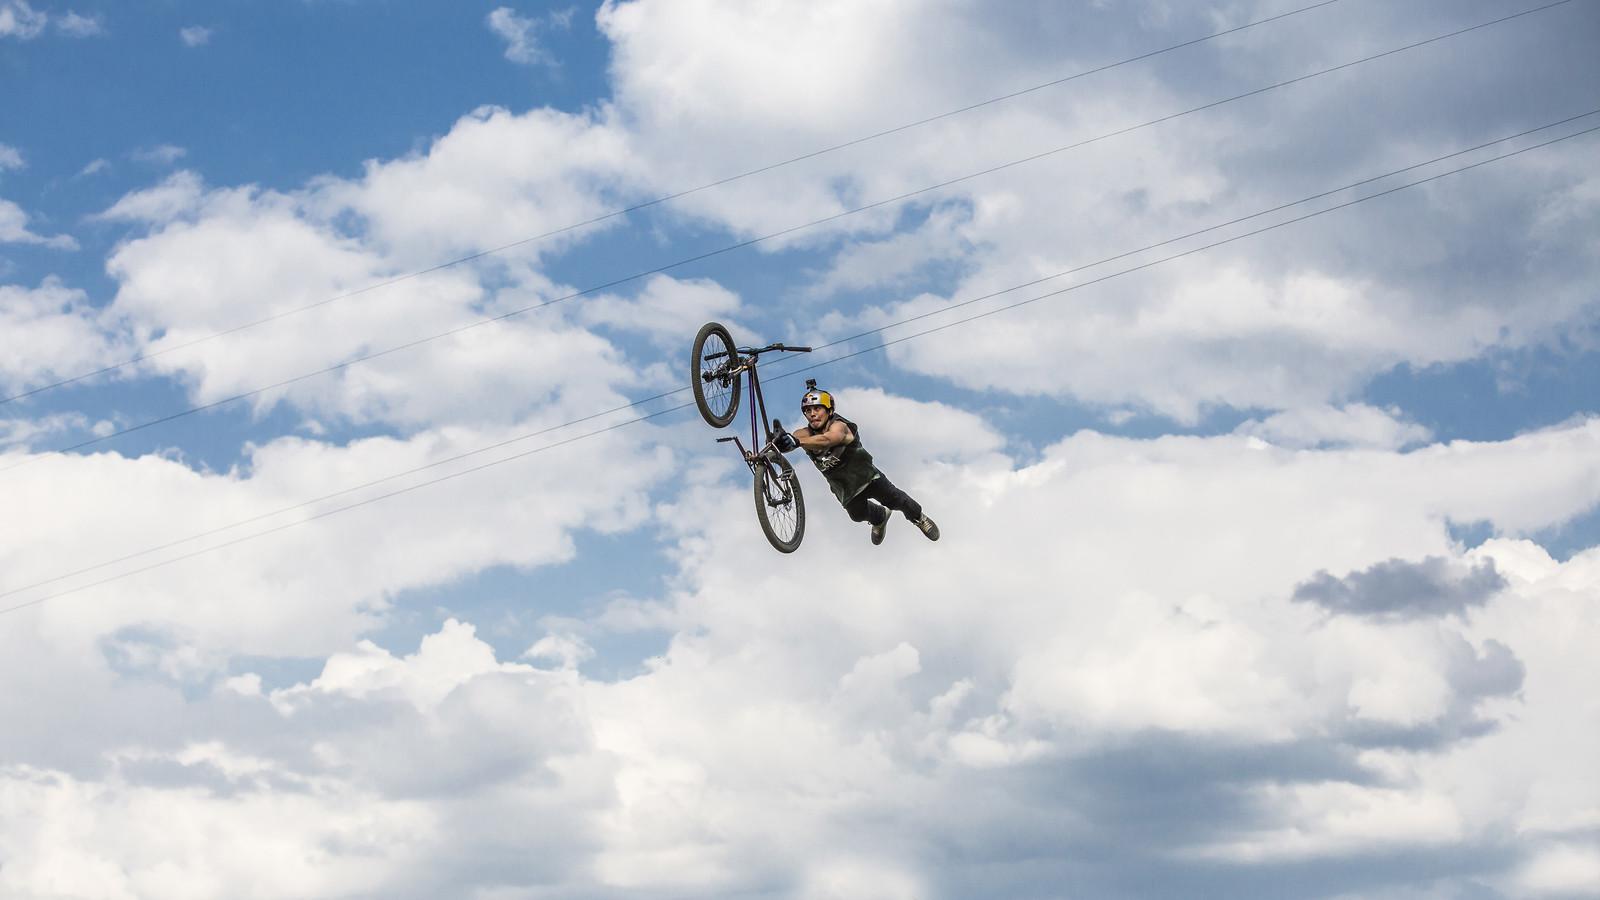 26 trix practice - phunkt.com - Mountain Biking Pictures - Vital MTB